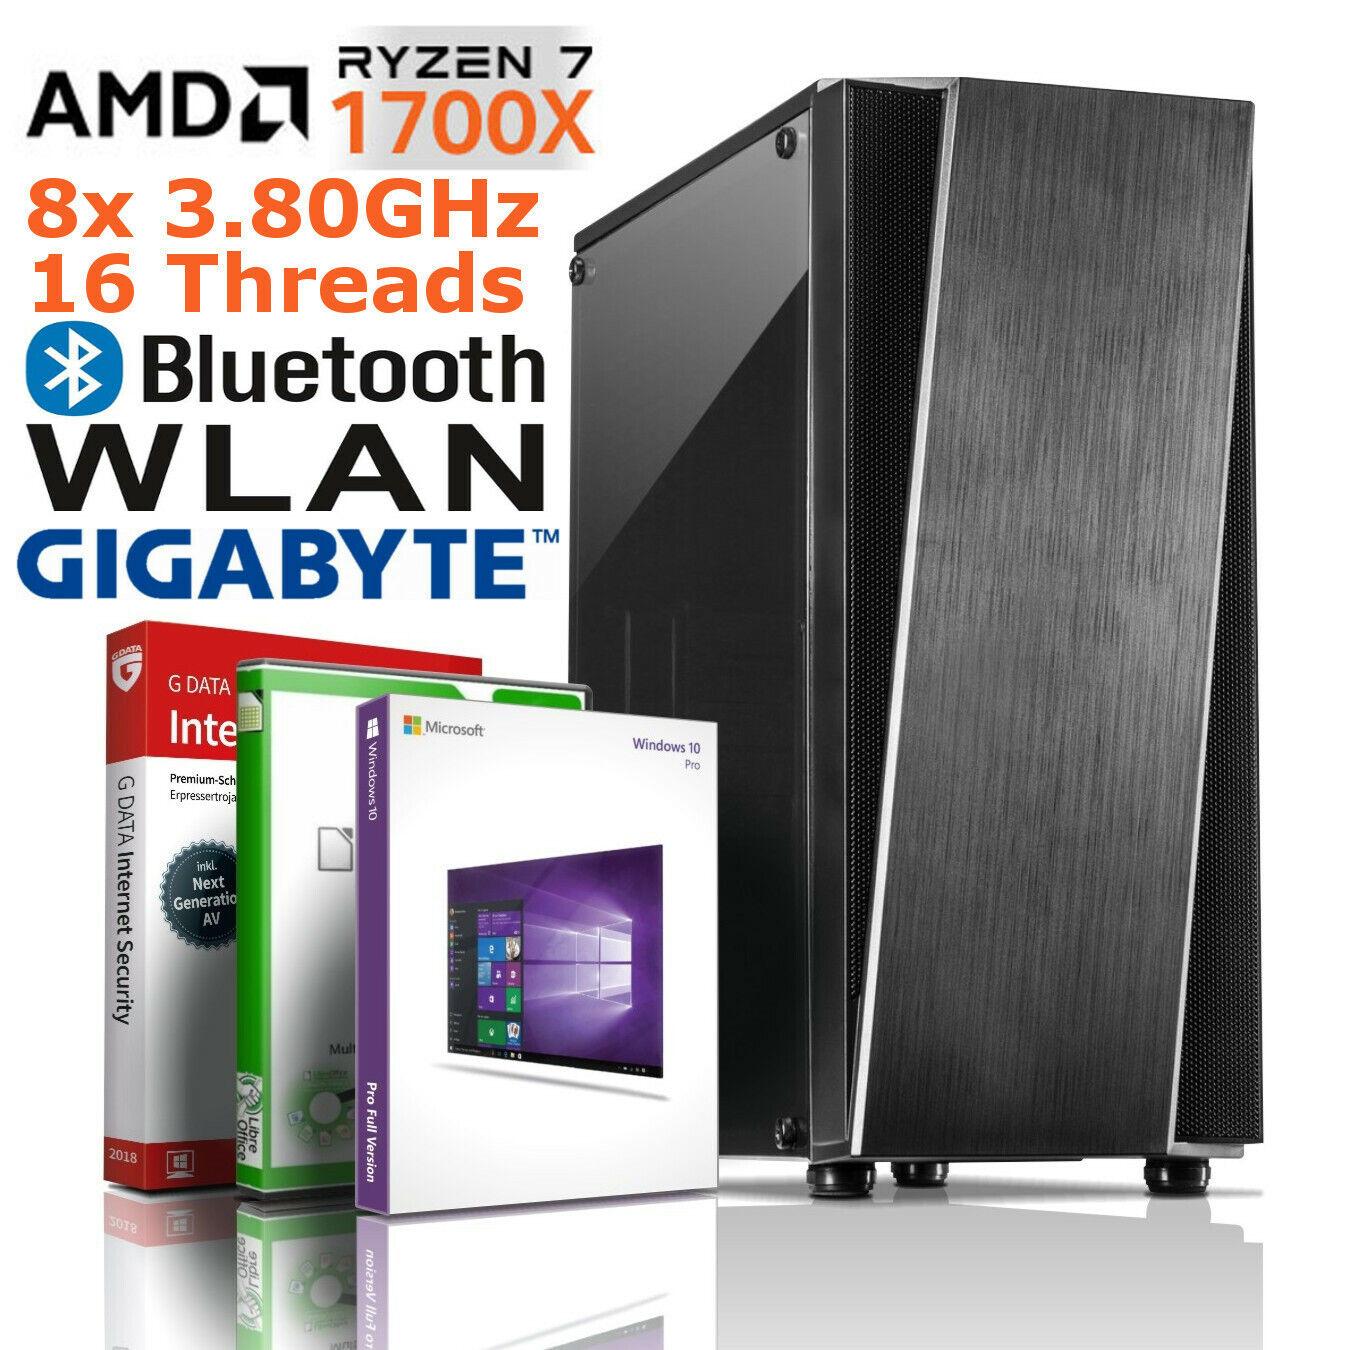 PC AMD RYZEN 7 1700X 8 Kerne 8x3.80GHz 32GB DDR4 SSD GTX RX Windows 10 Computer